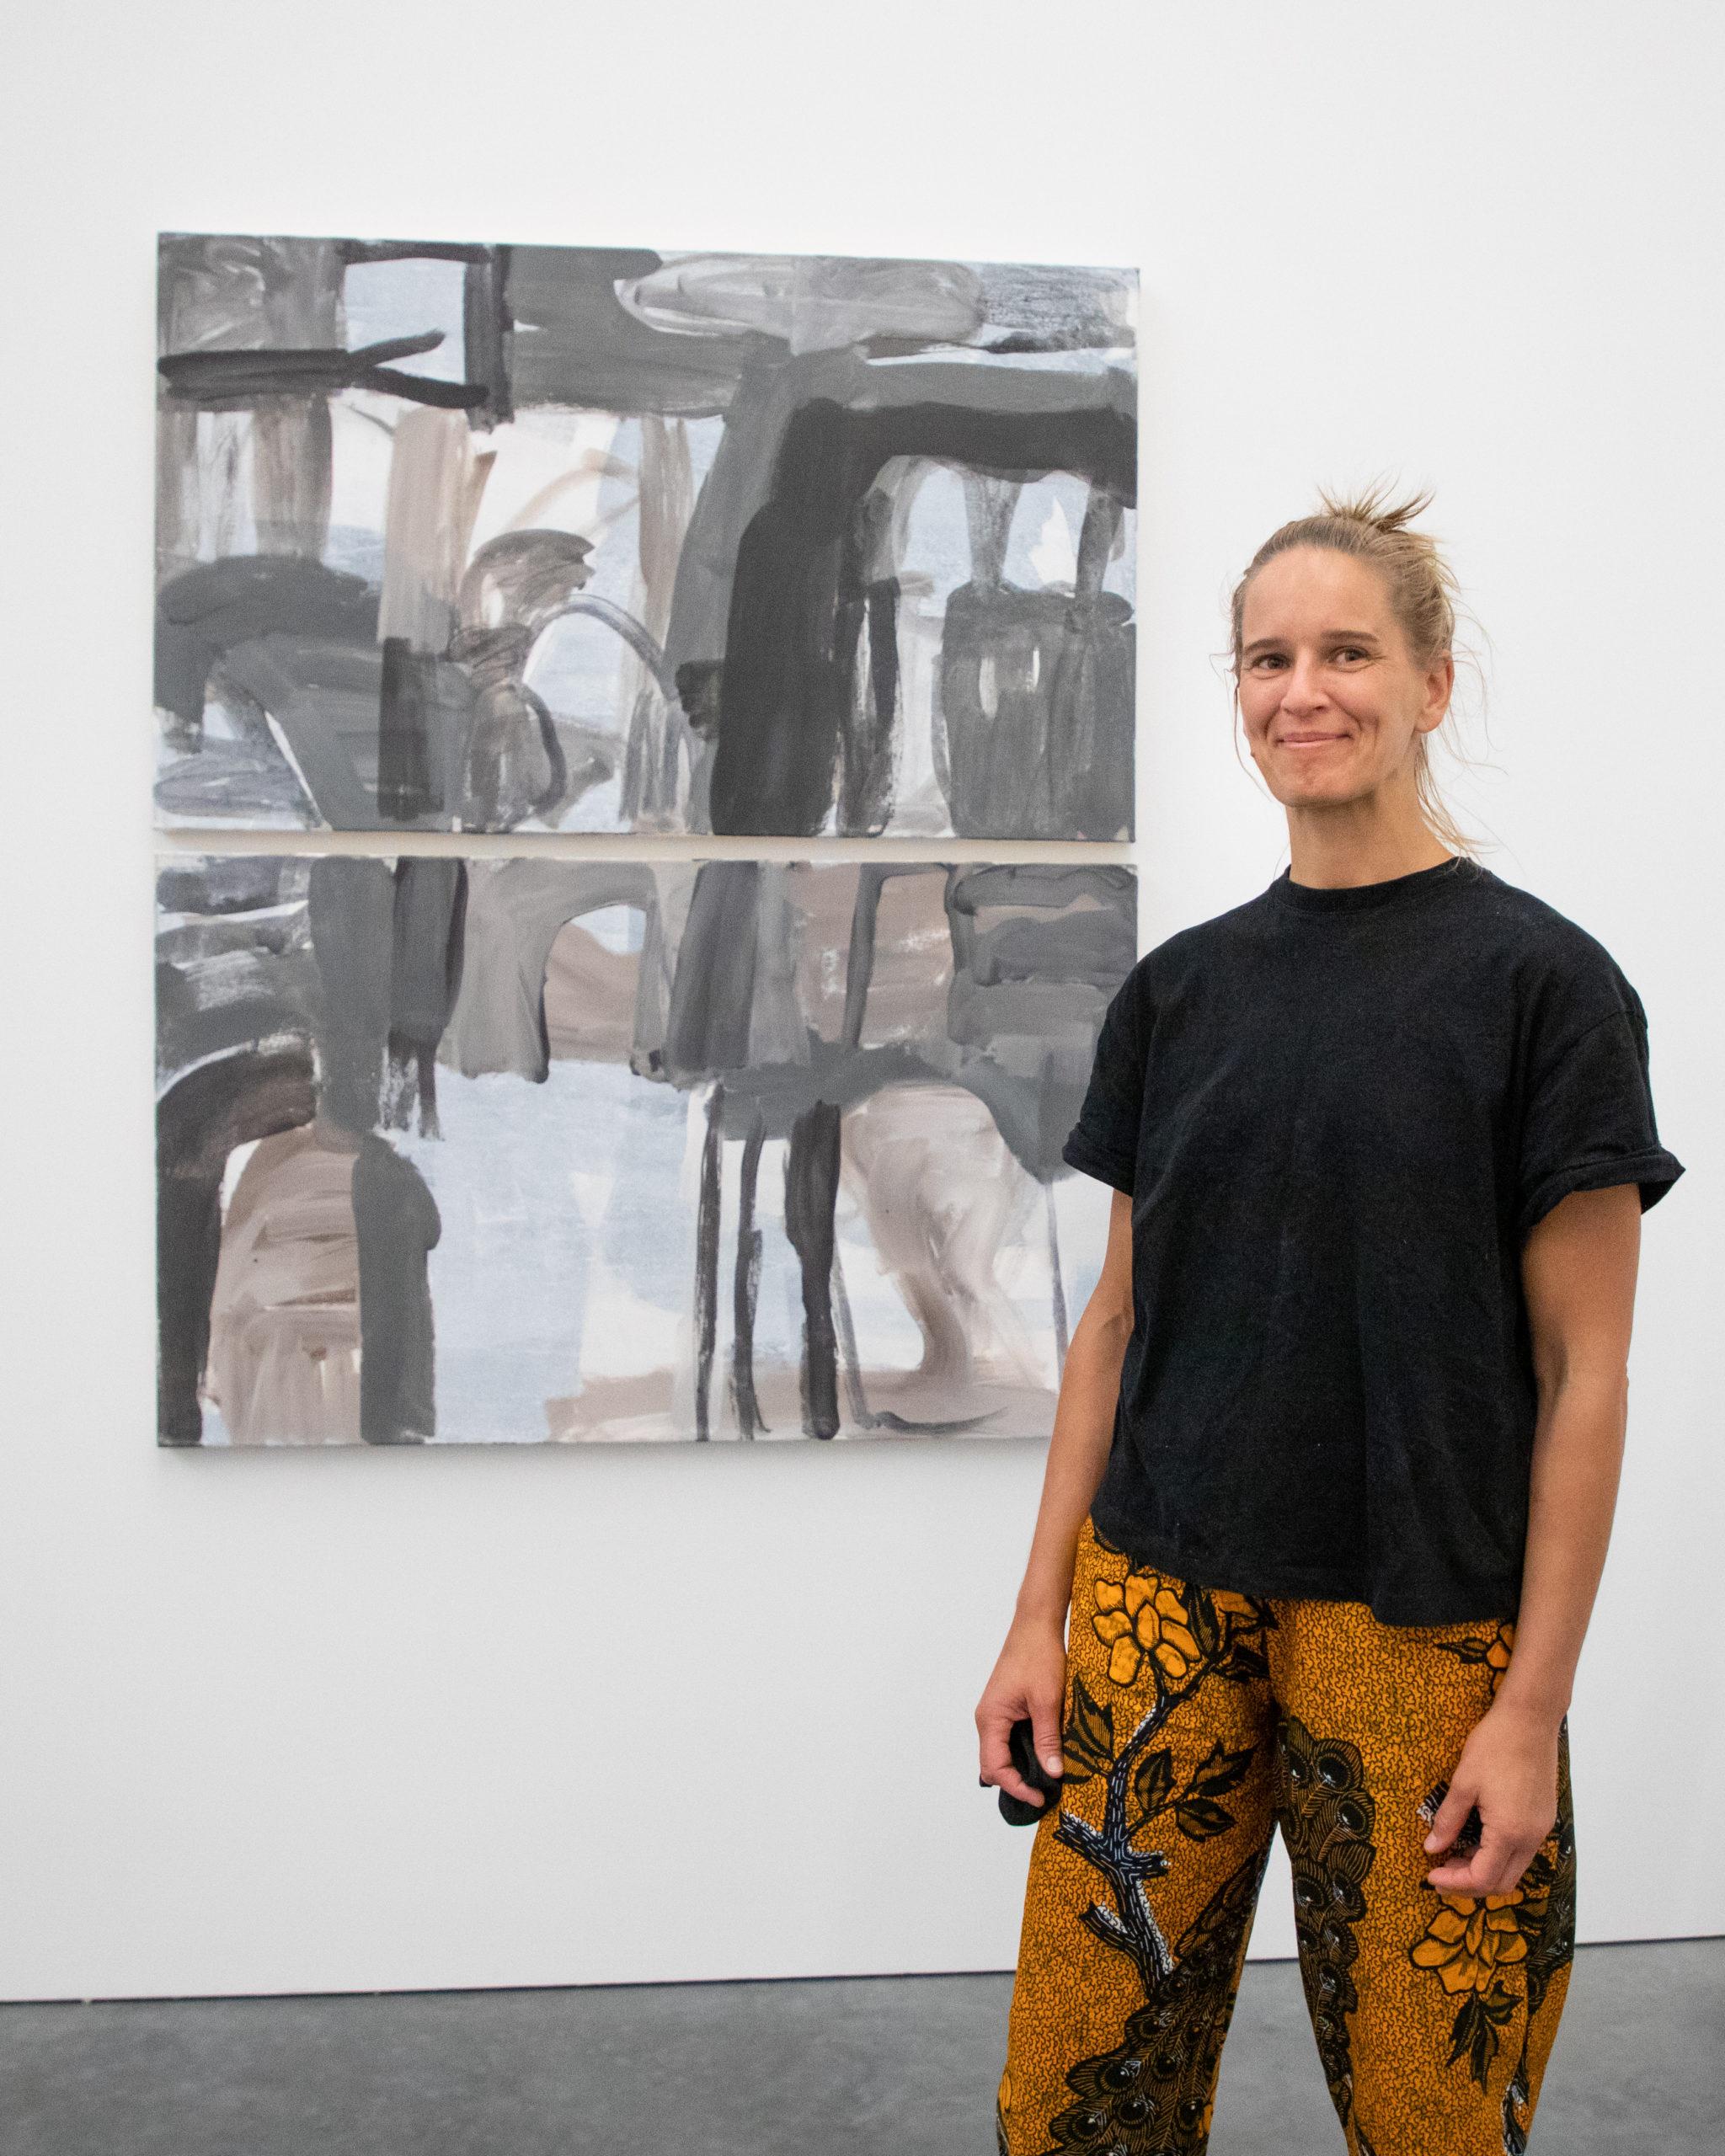 Artist Virva Hinnemo at the opening of